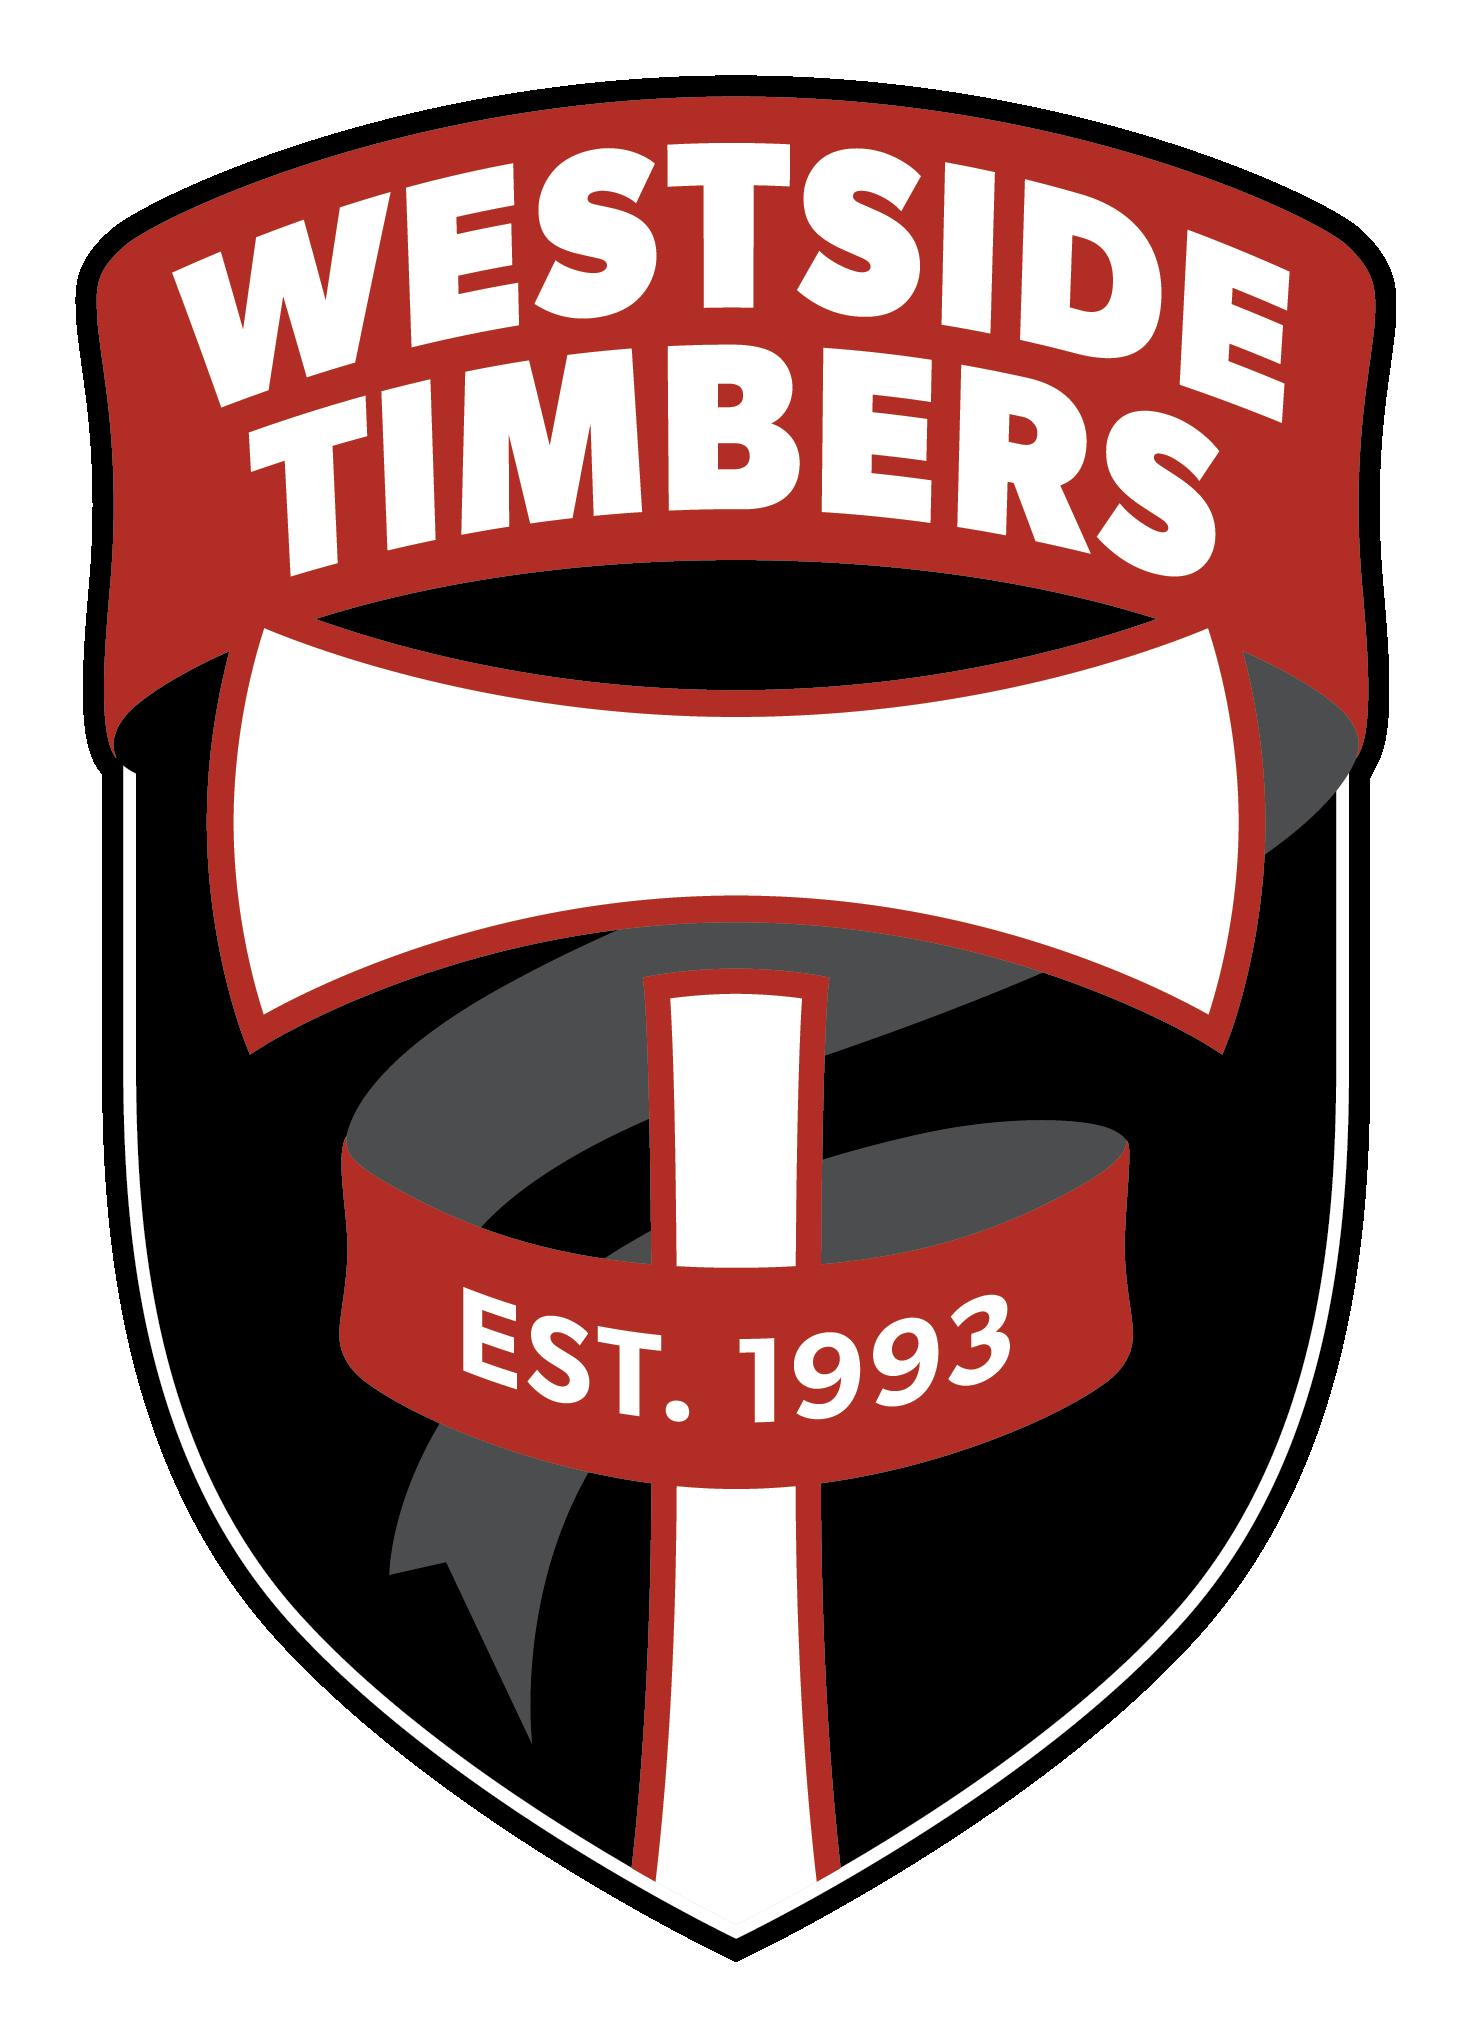 Westside Timbers